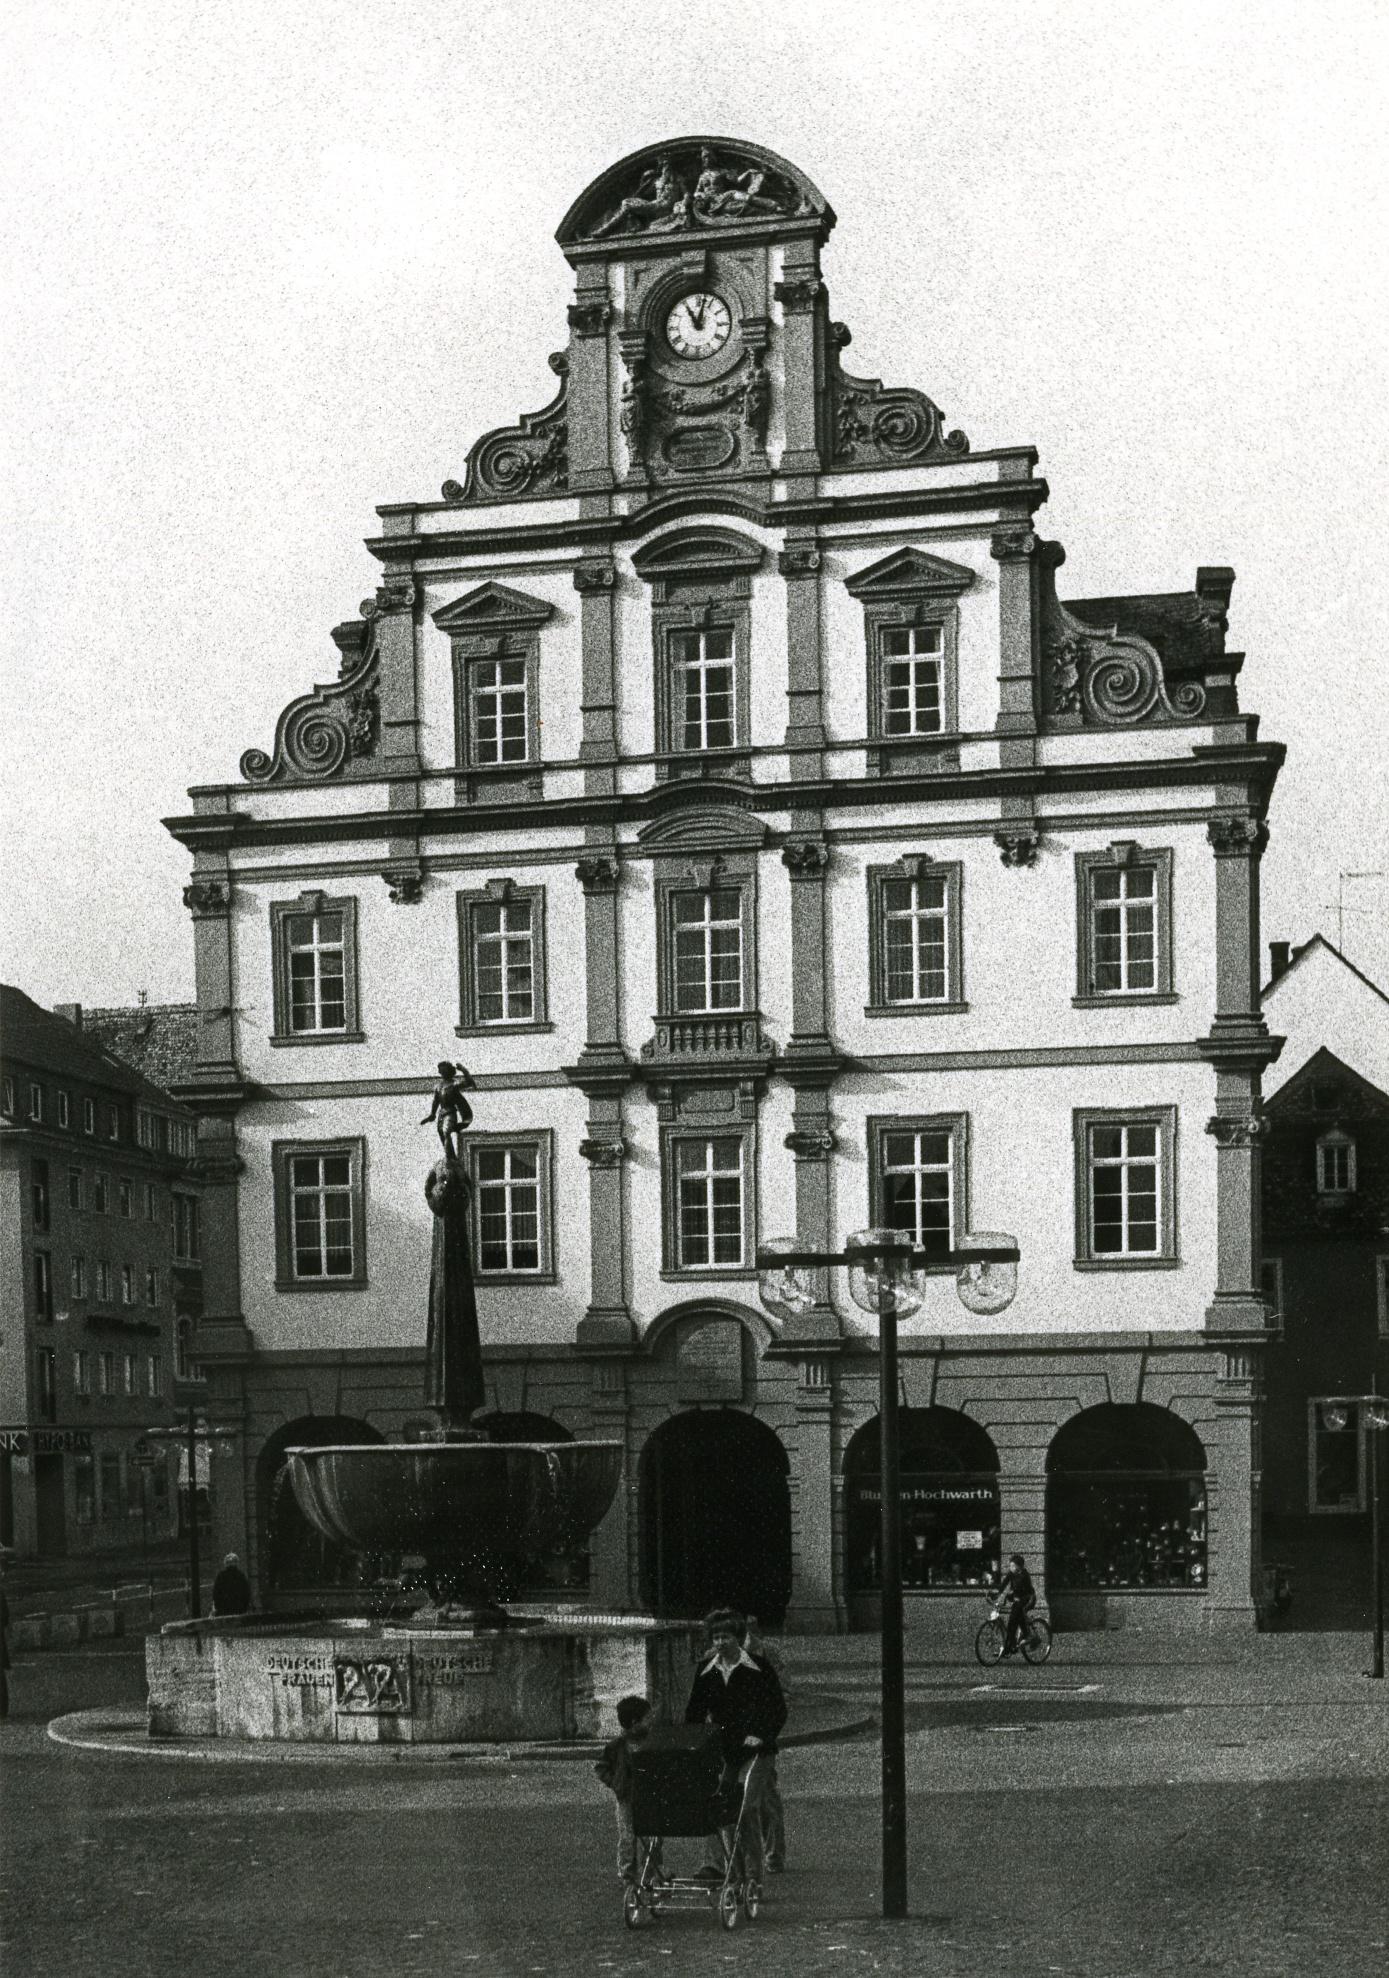 Fotografie Maximilianstraße Alte Münze Iii Historisches